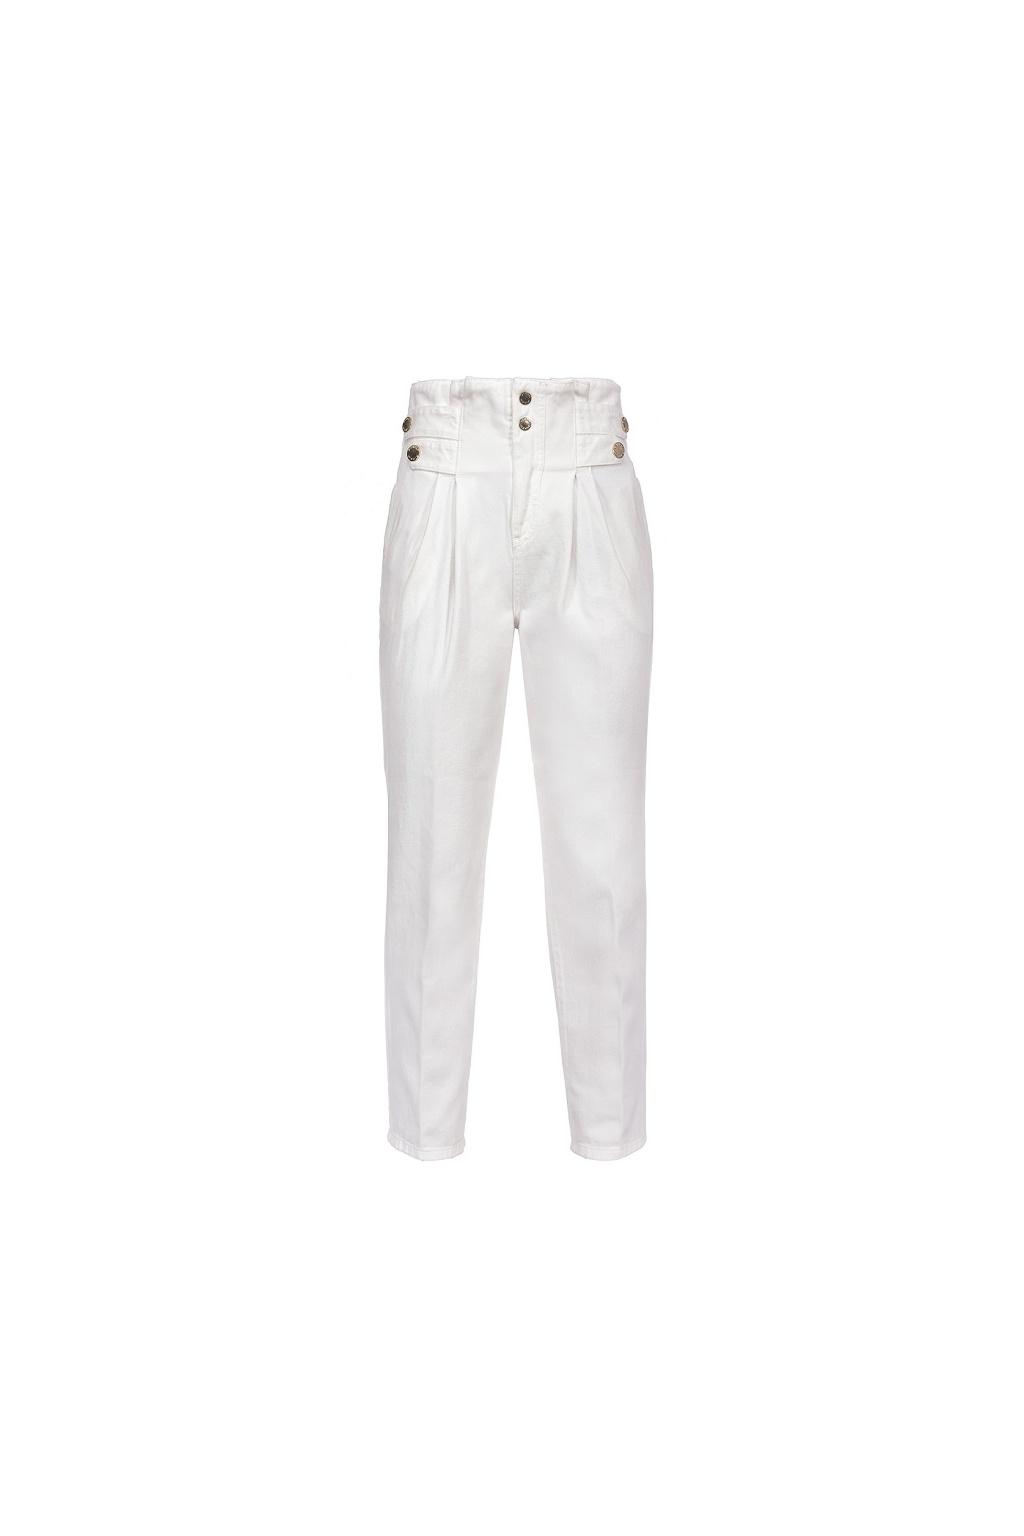 Dámské džíny Pinko New Cara 1 Fashion Carrot PJ456A bílé